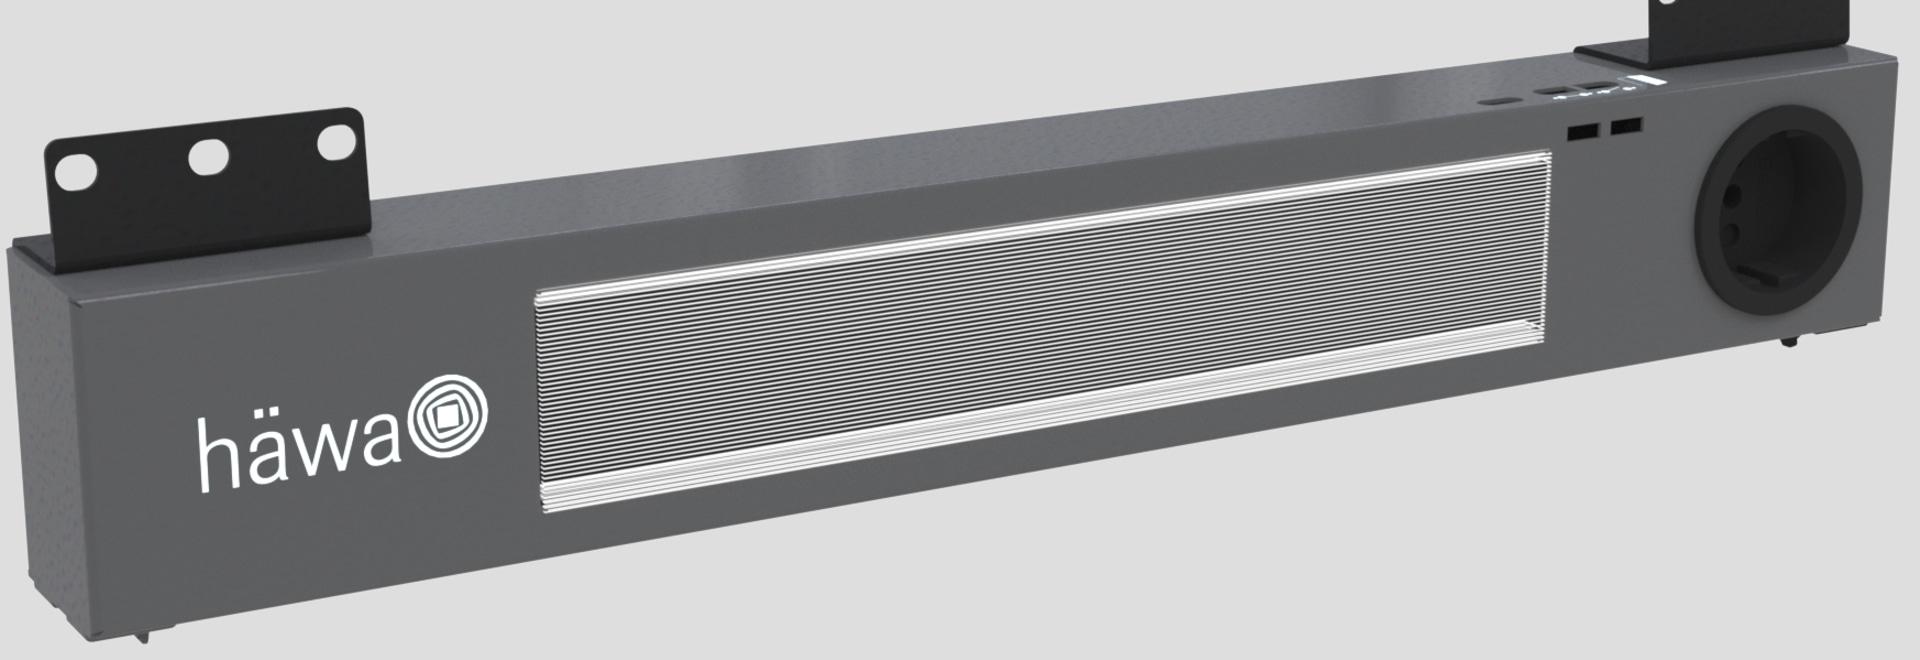 Sensor Operated LED-Schaltschrankleuchte |häwa